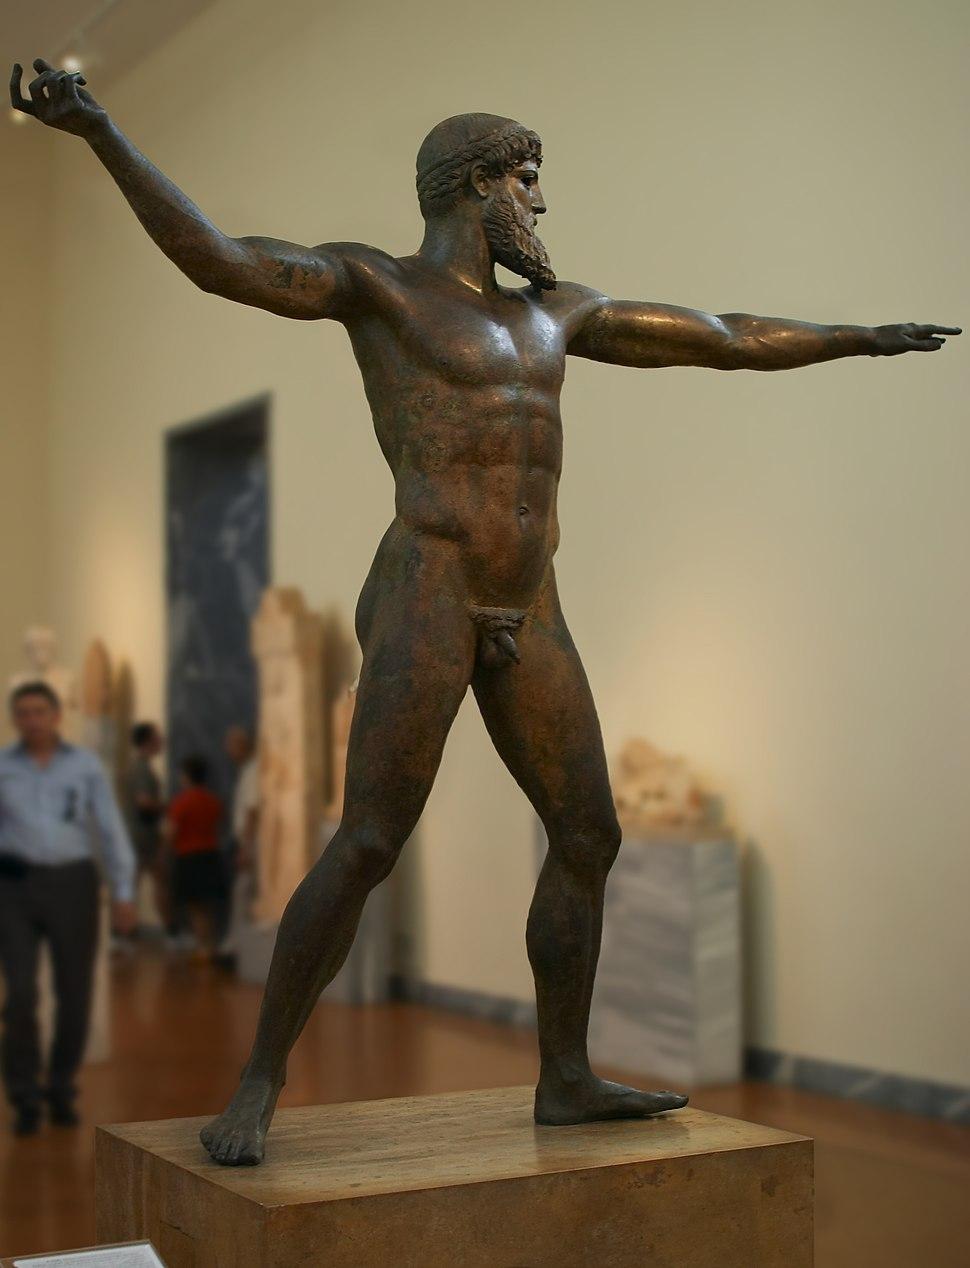 Athens - National Archeological Museum - Zeus (or Poseidon) statue - 20060930